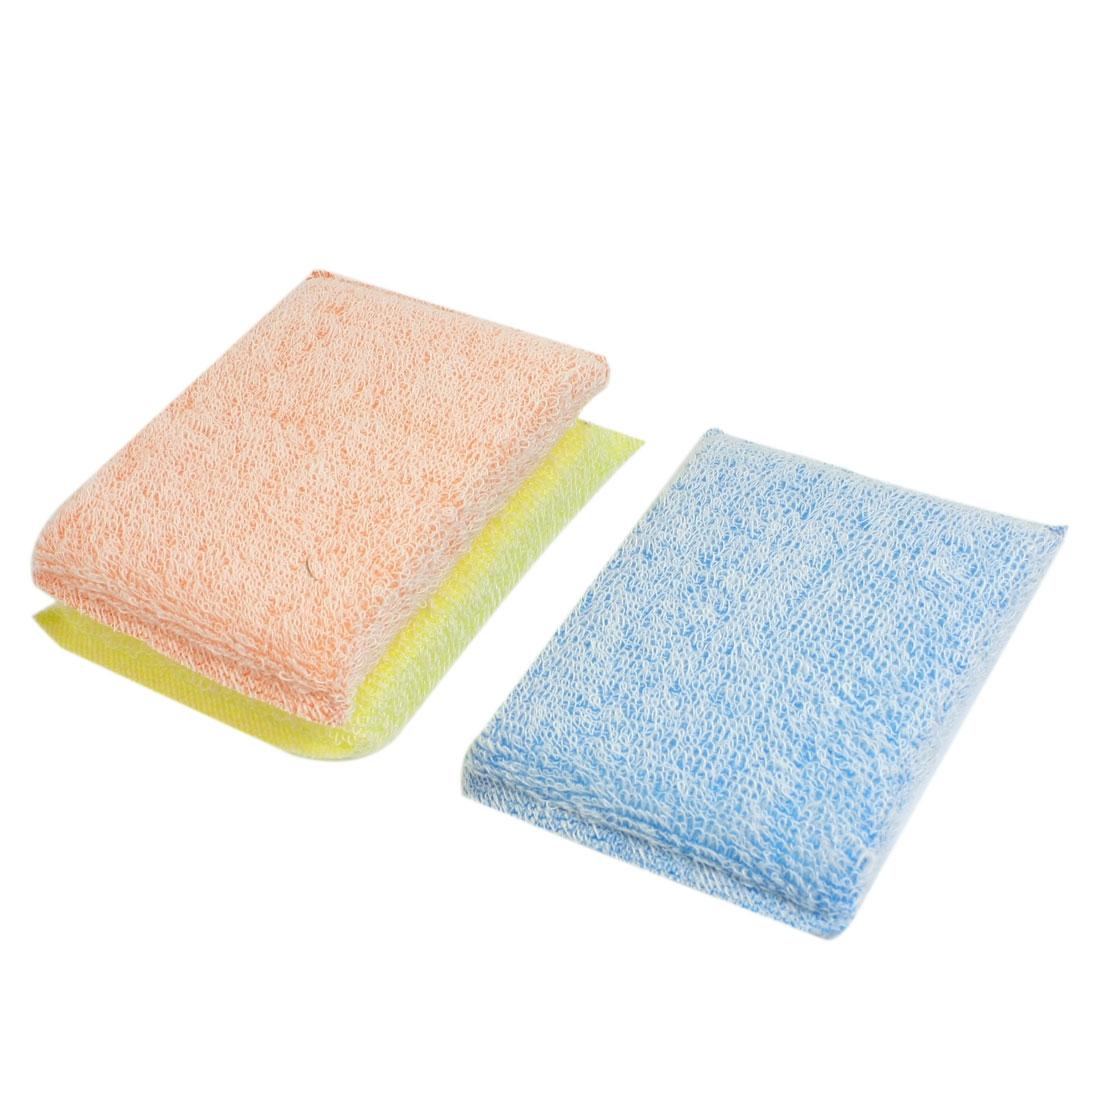 3Pcs Yellow Blue Orange Scrub Sponge Padded Dish Pad Bowl Cup Cleaner